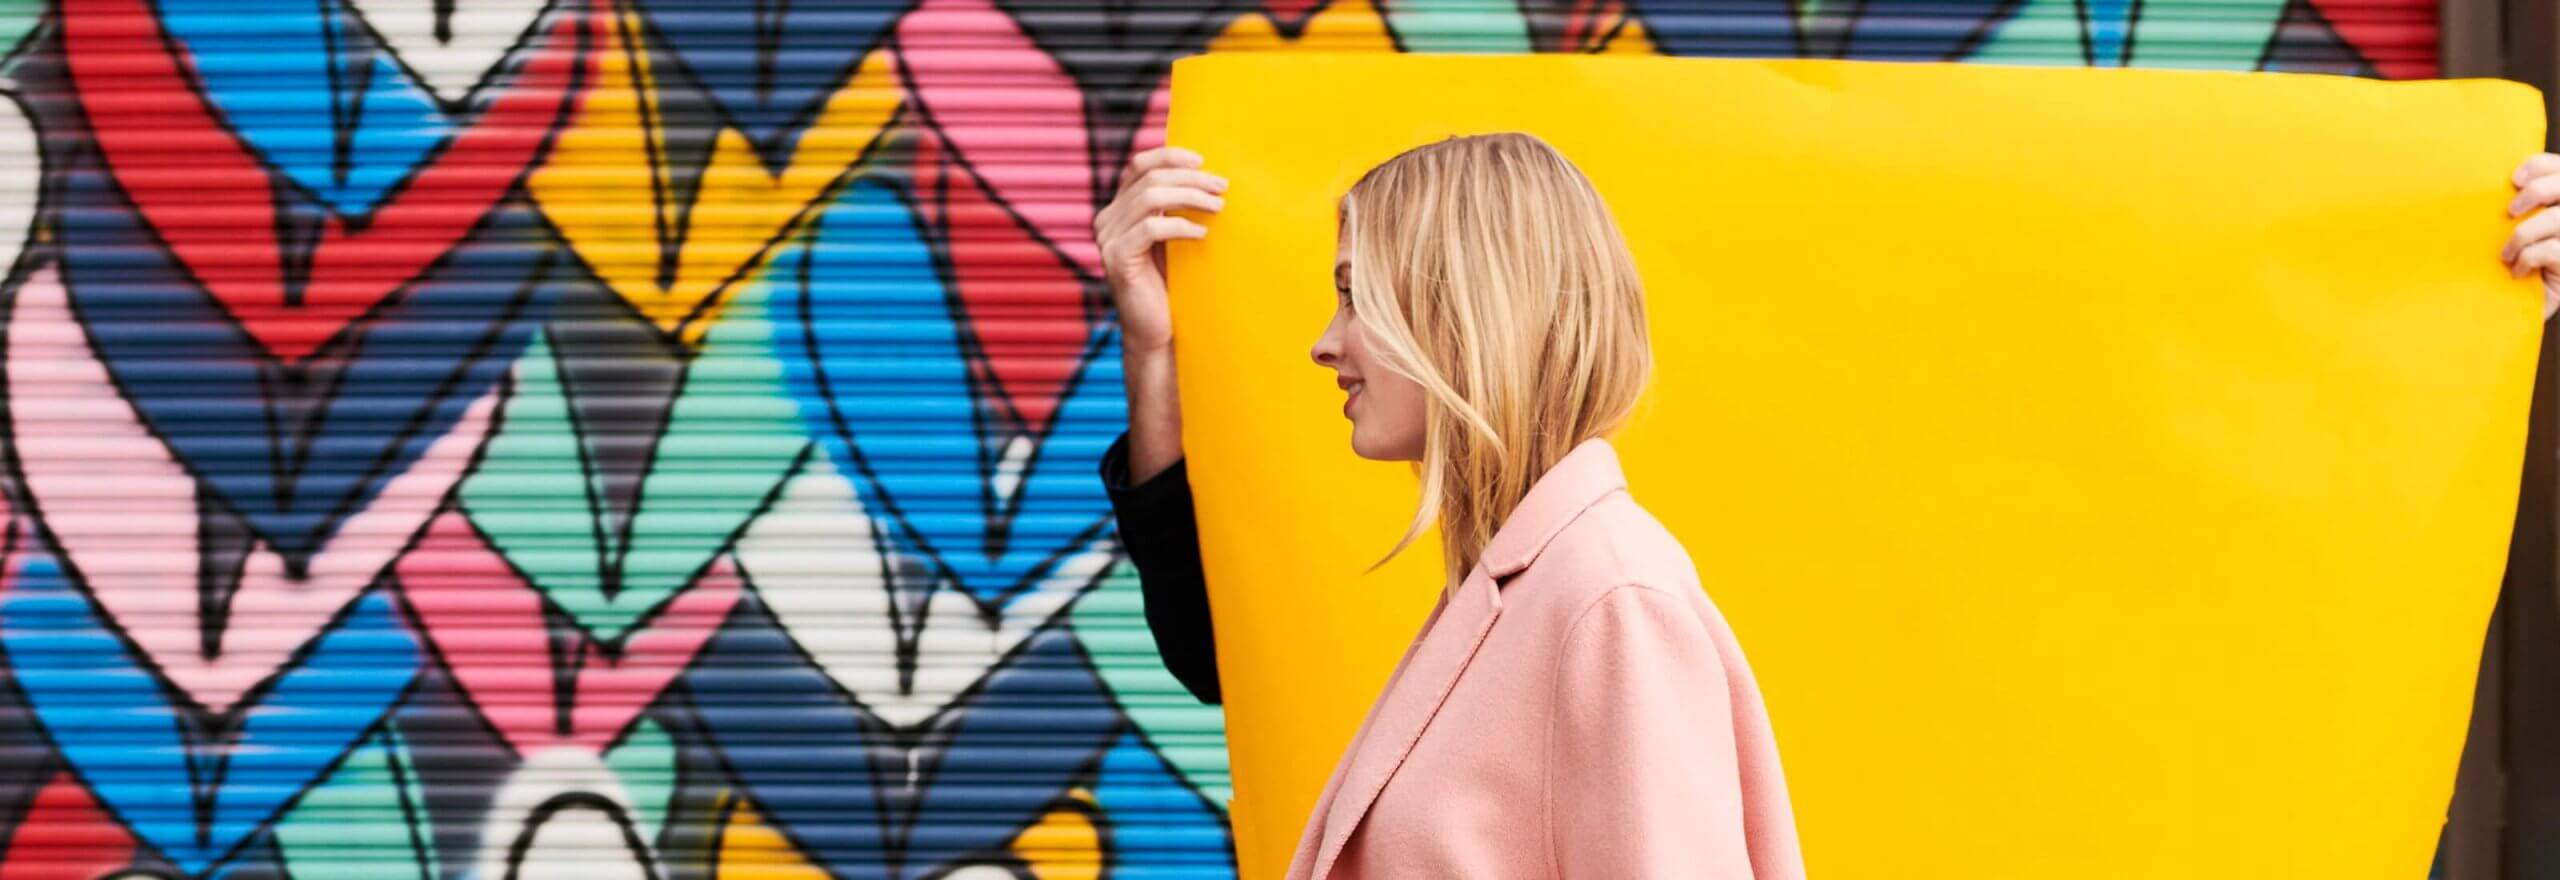 Woman walking in front of art mural